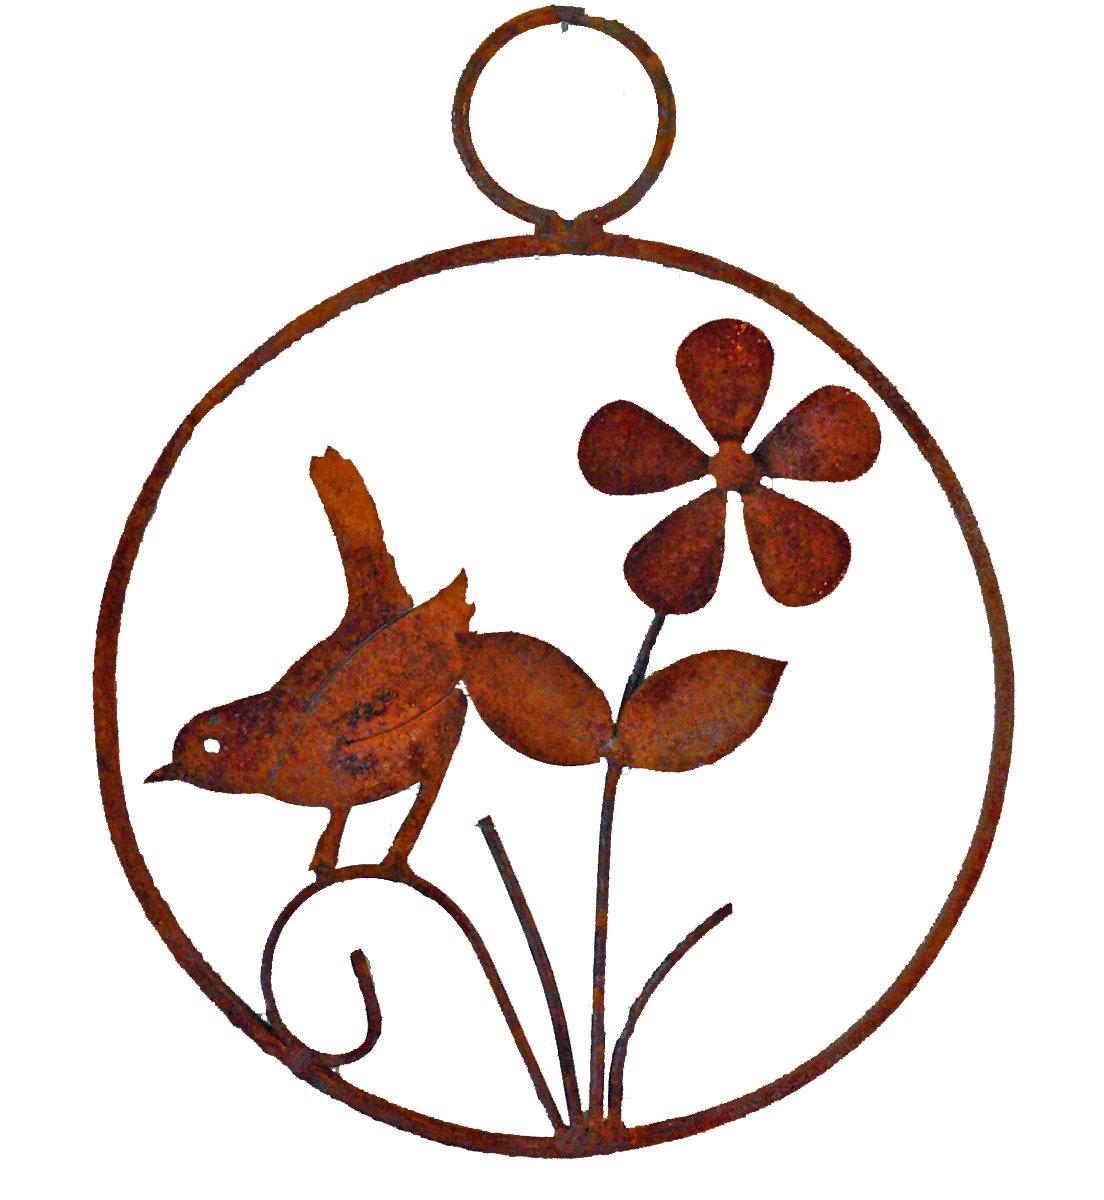 Elegant-Garden-Design-Bird-and-Flower-Wreath-Rusty-Patina